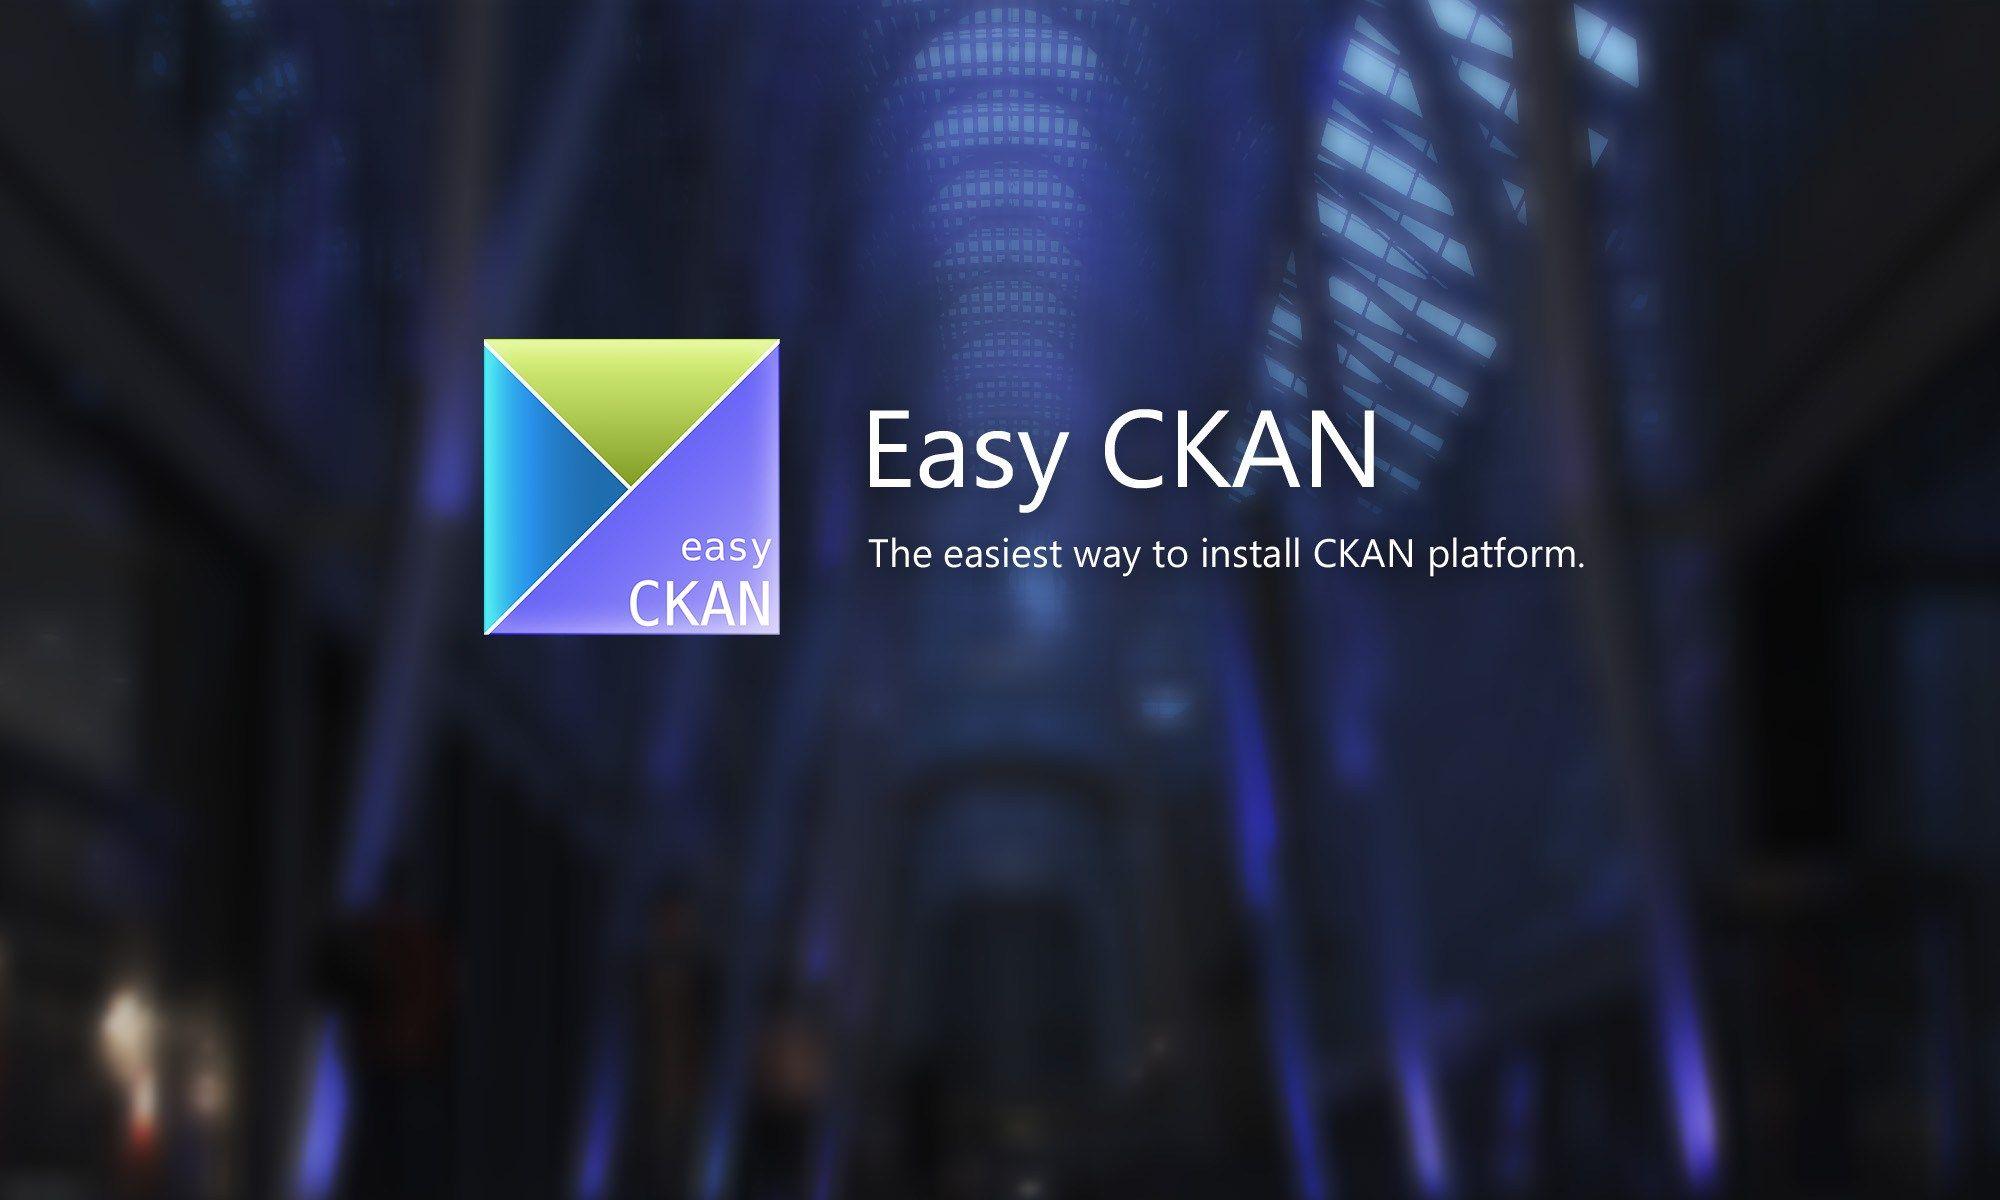 Easy CKAN: The easiest way to install CKAN